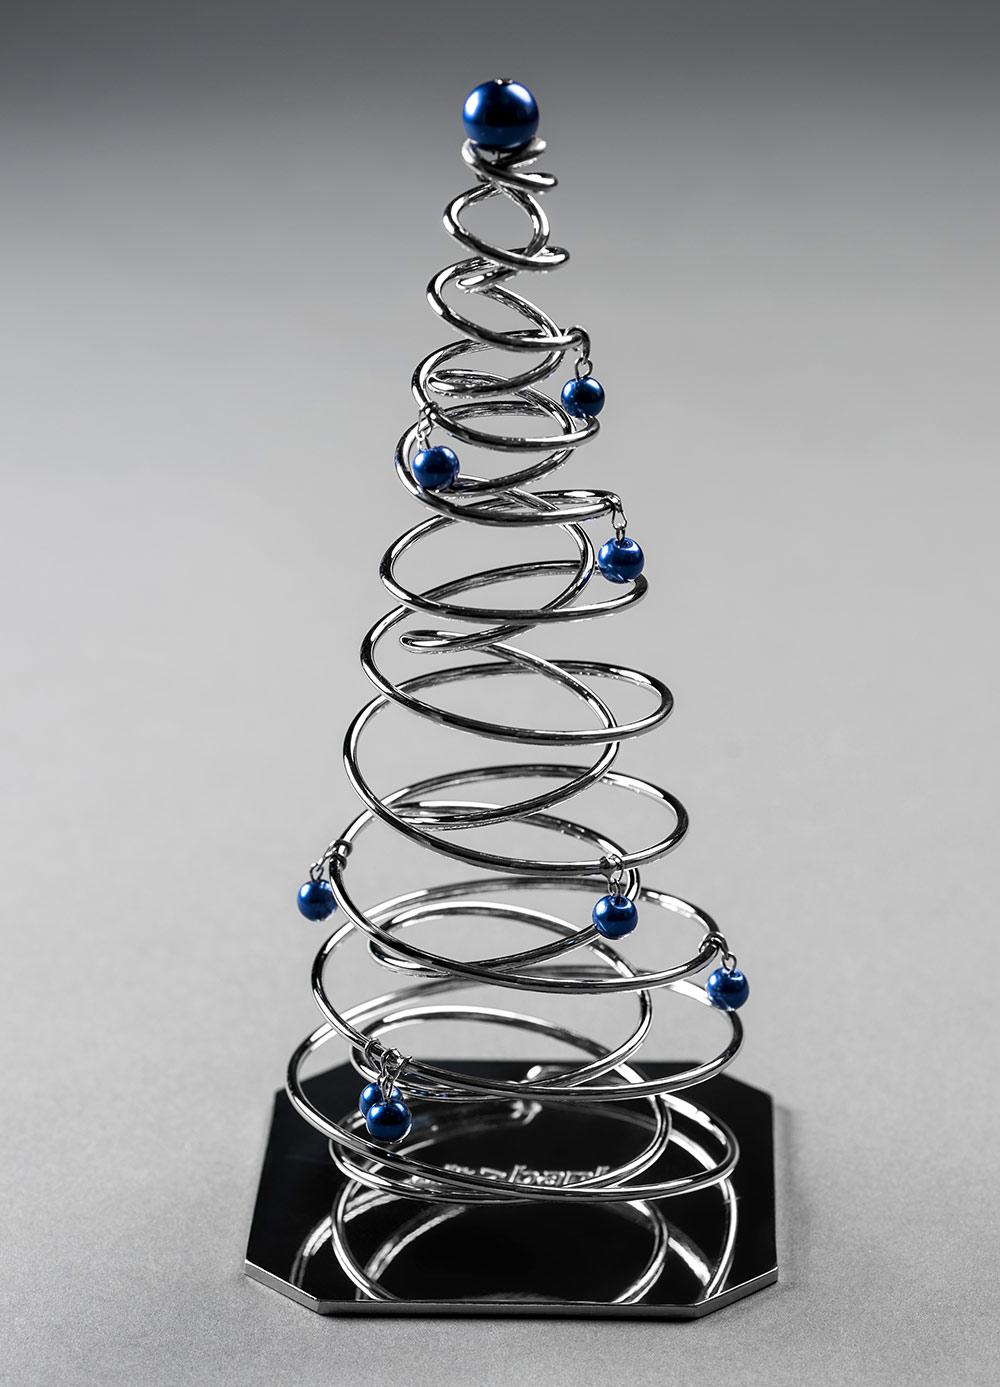 Handmade metal Christmas tree and corporate color Christmas balls. Chrome and dark blue.